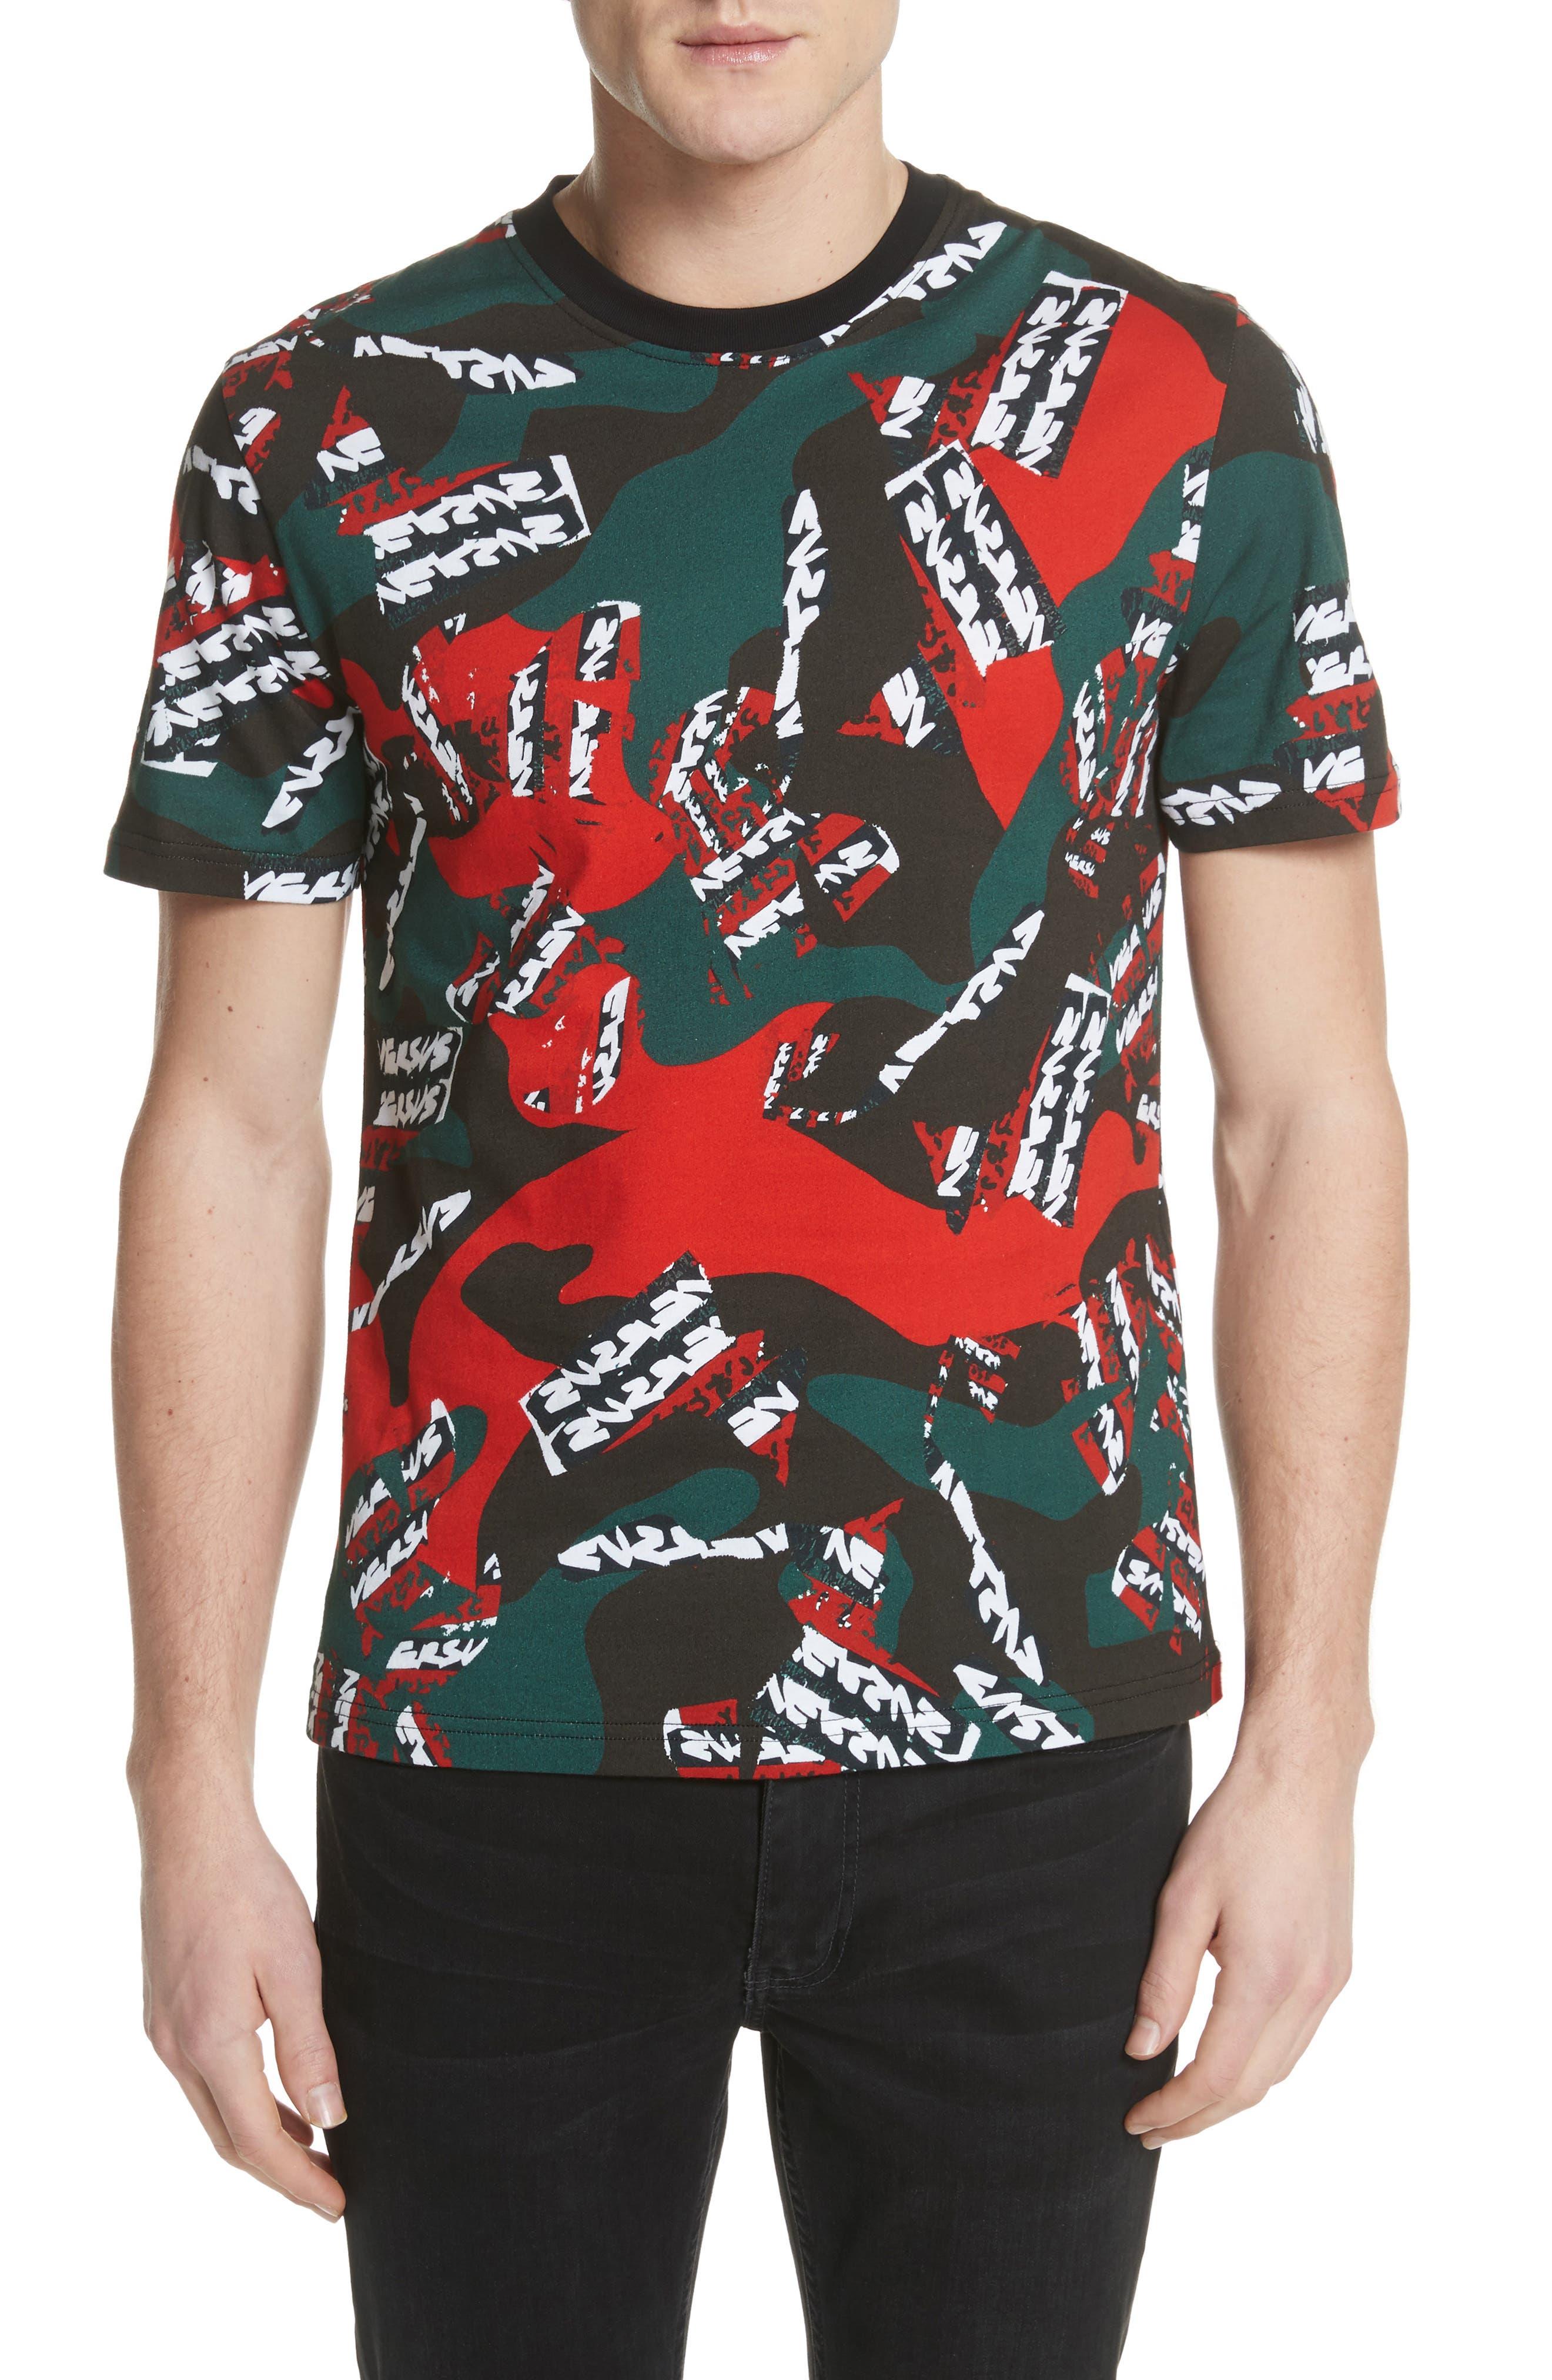 VERSUS by Versace Camo T-Shirt,                             Main thumbnail 1, color,                             626